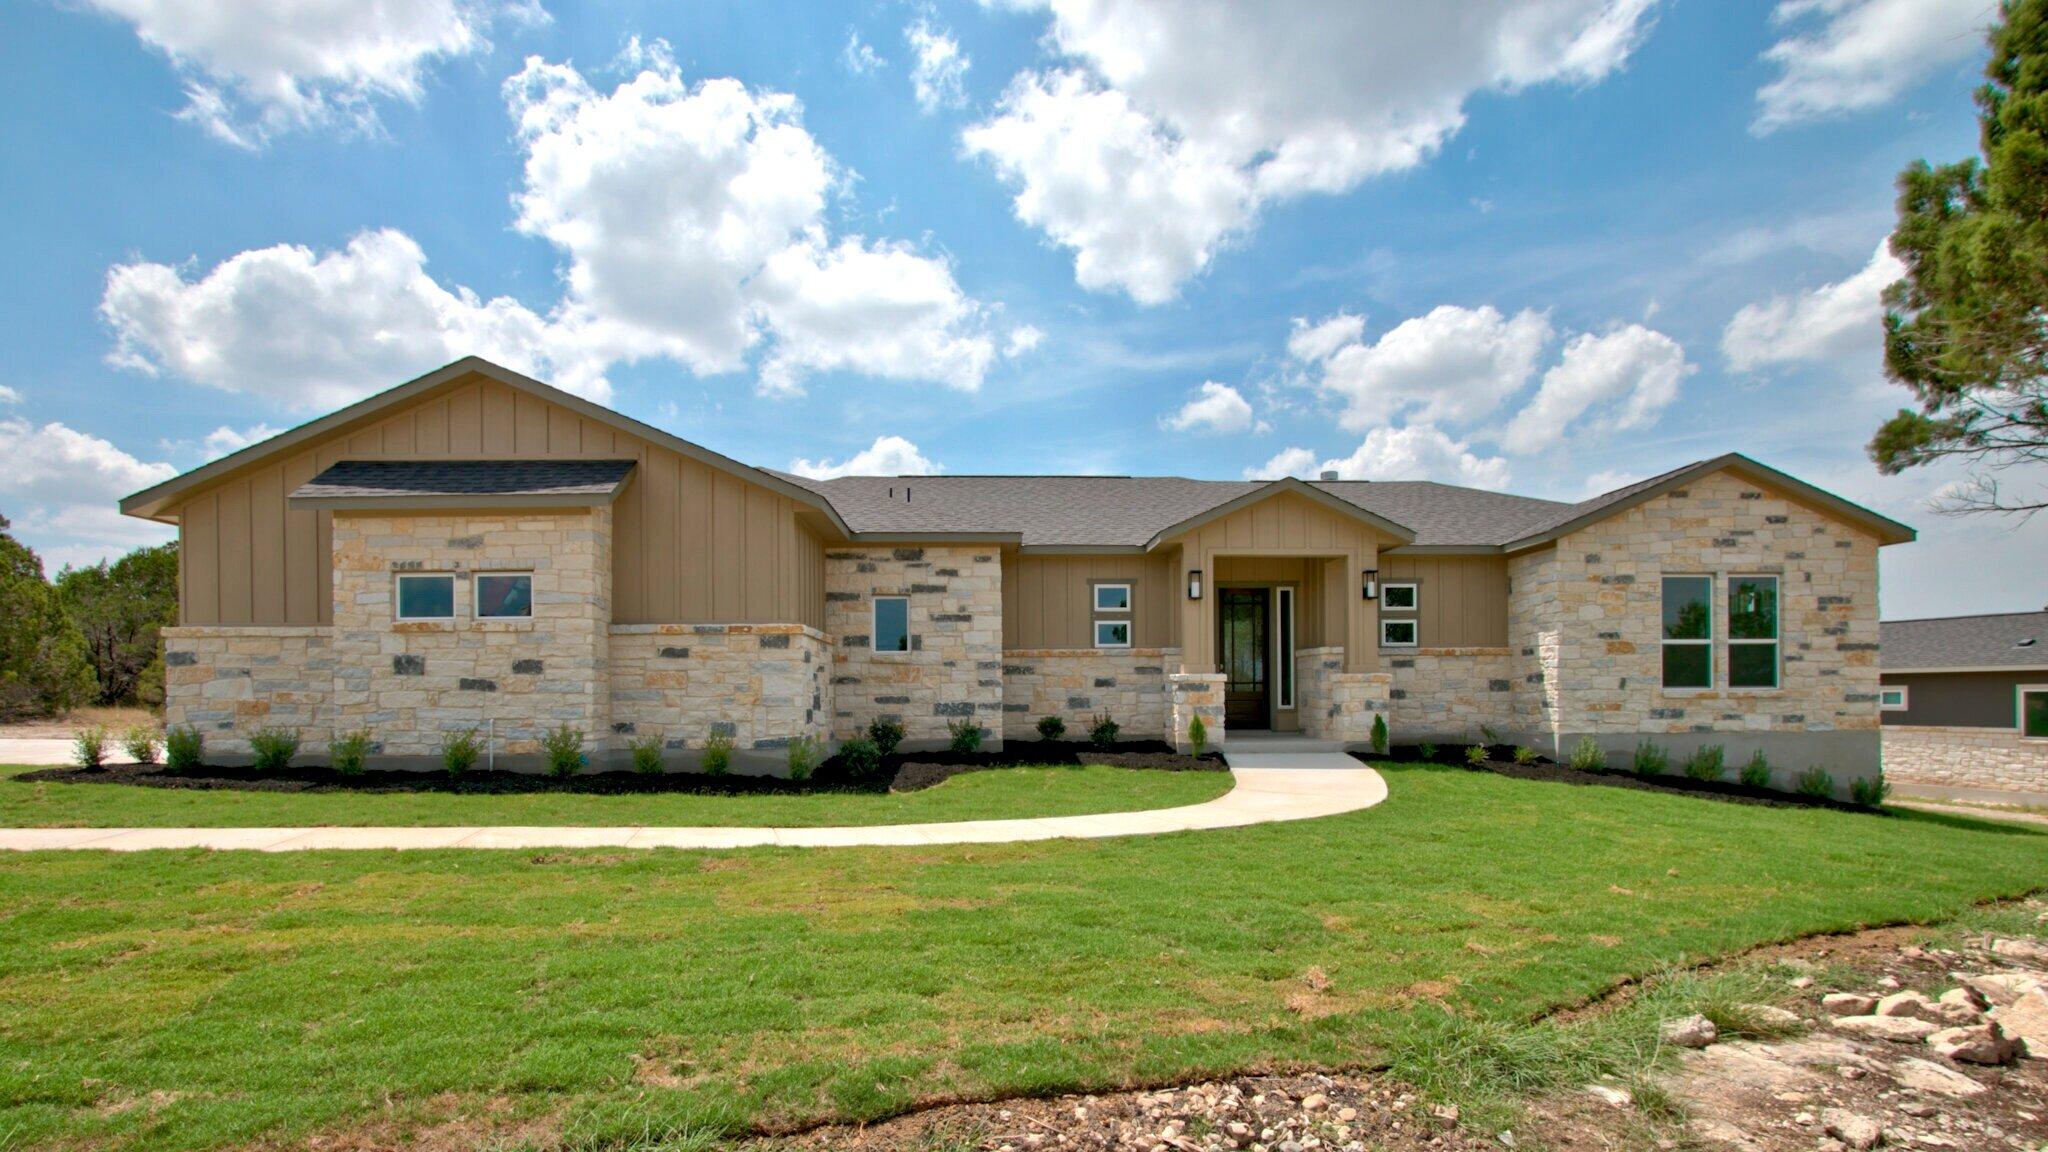 308 Warbler Drive - Spring Branch, TX 78070$382,900